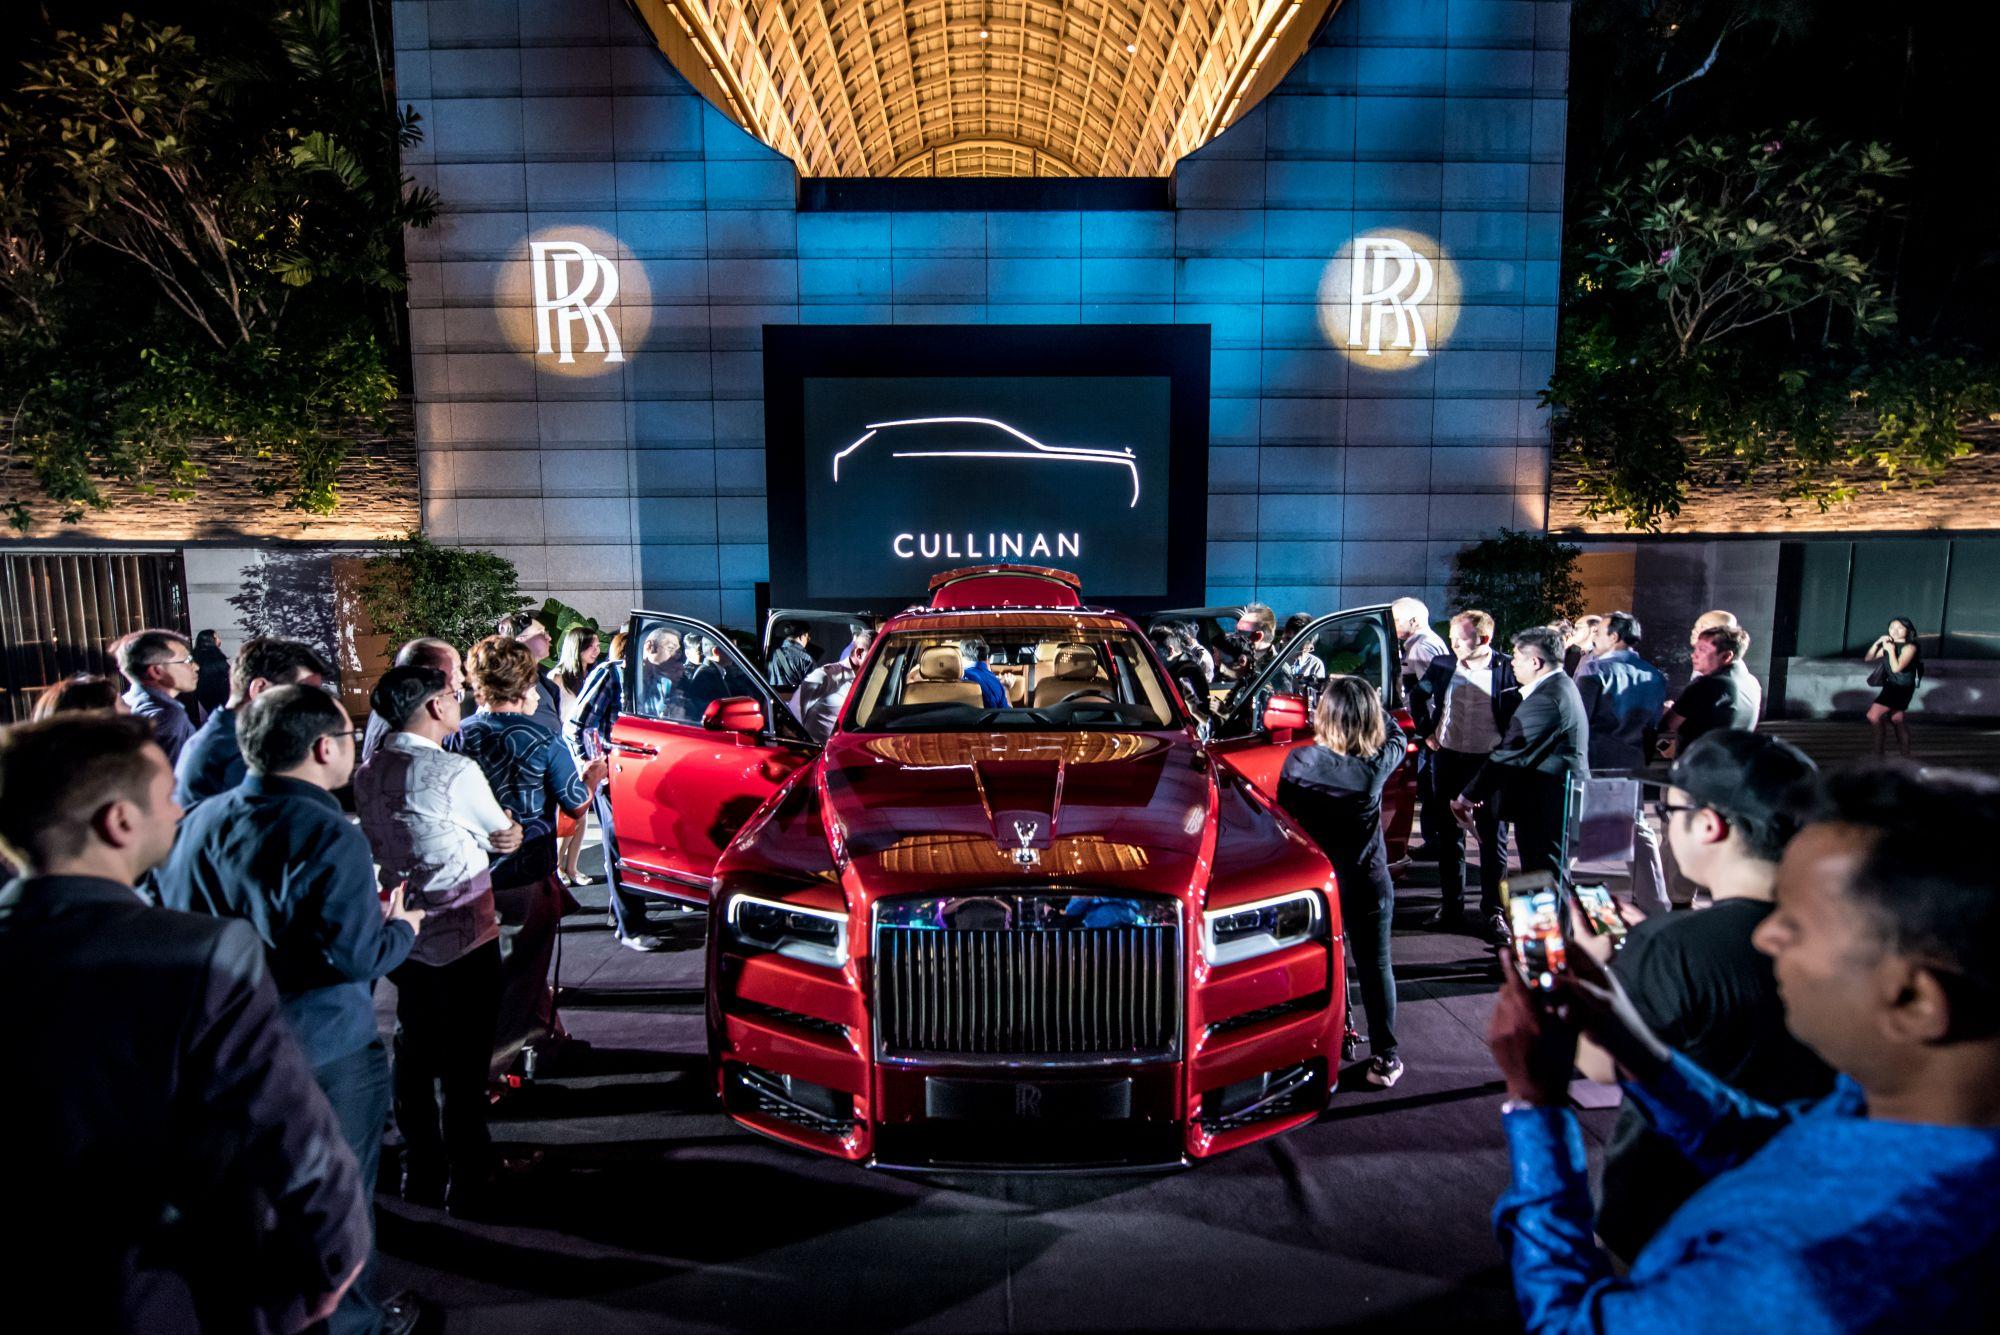 The Rolls-Royce Cullinan